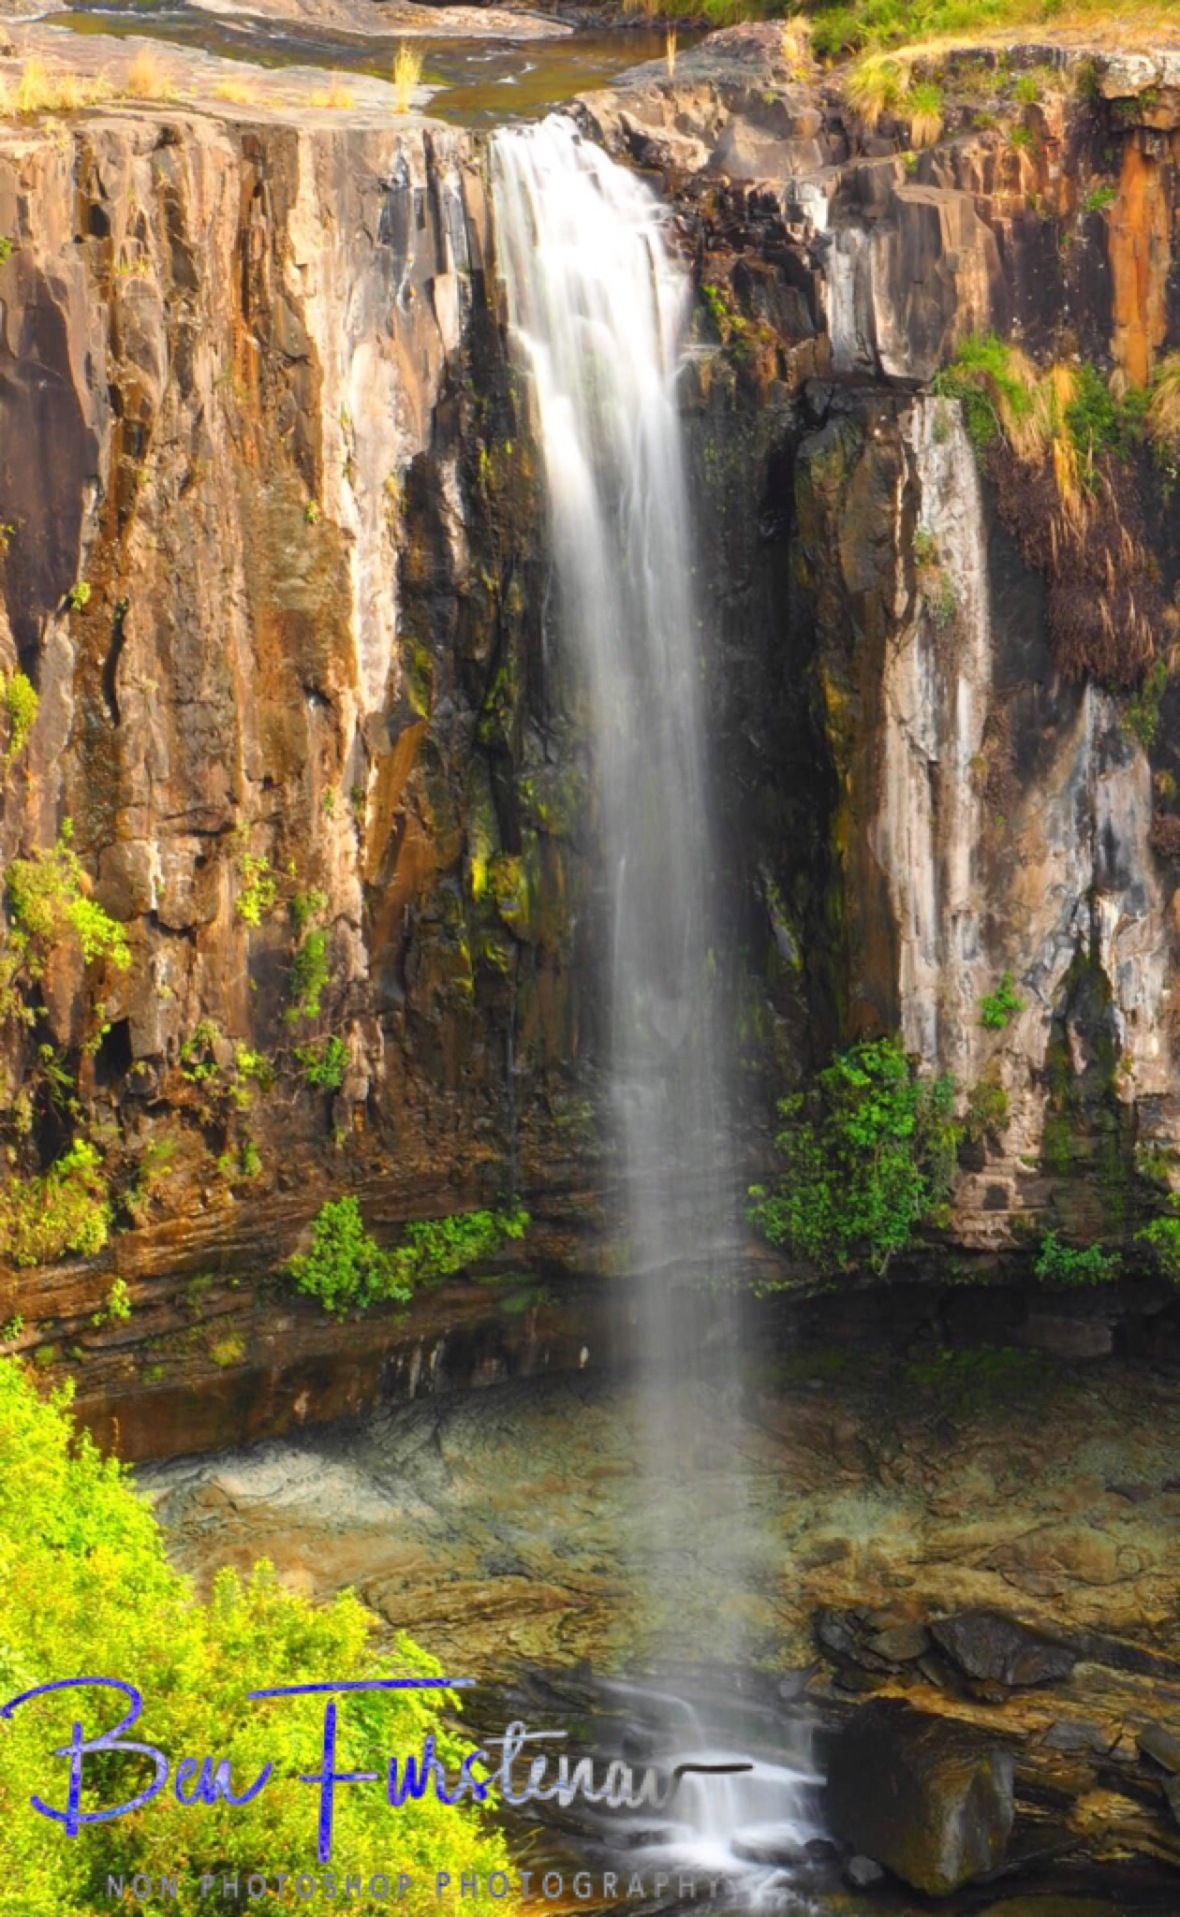 Sterkspruit Falls